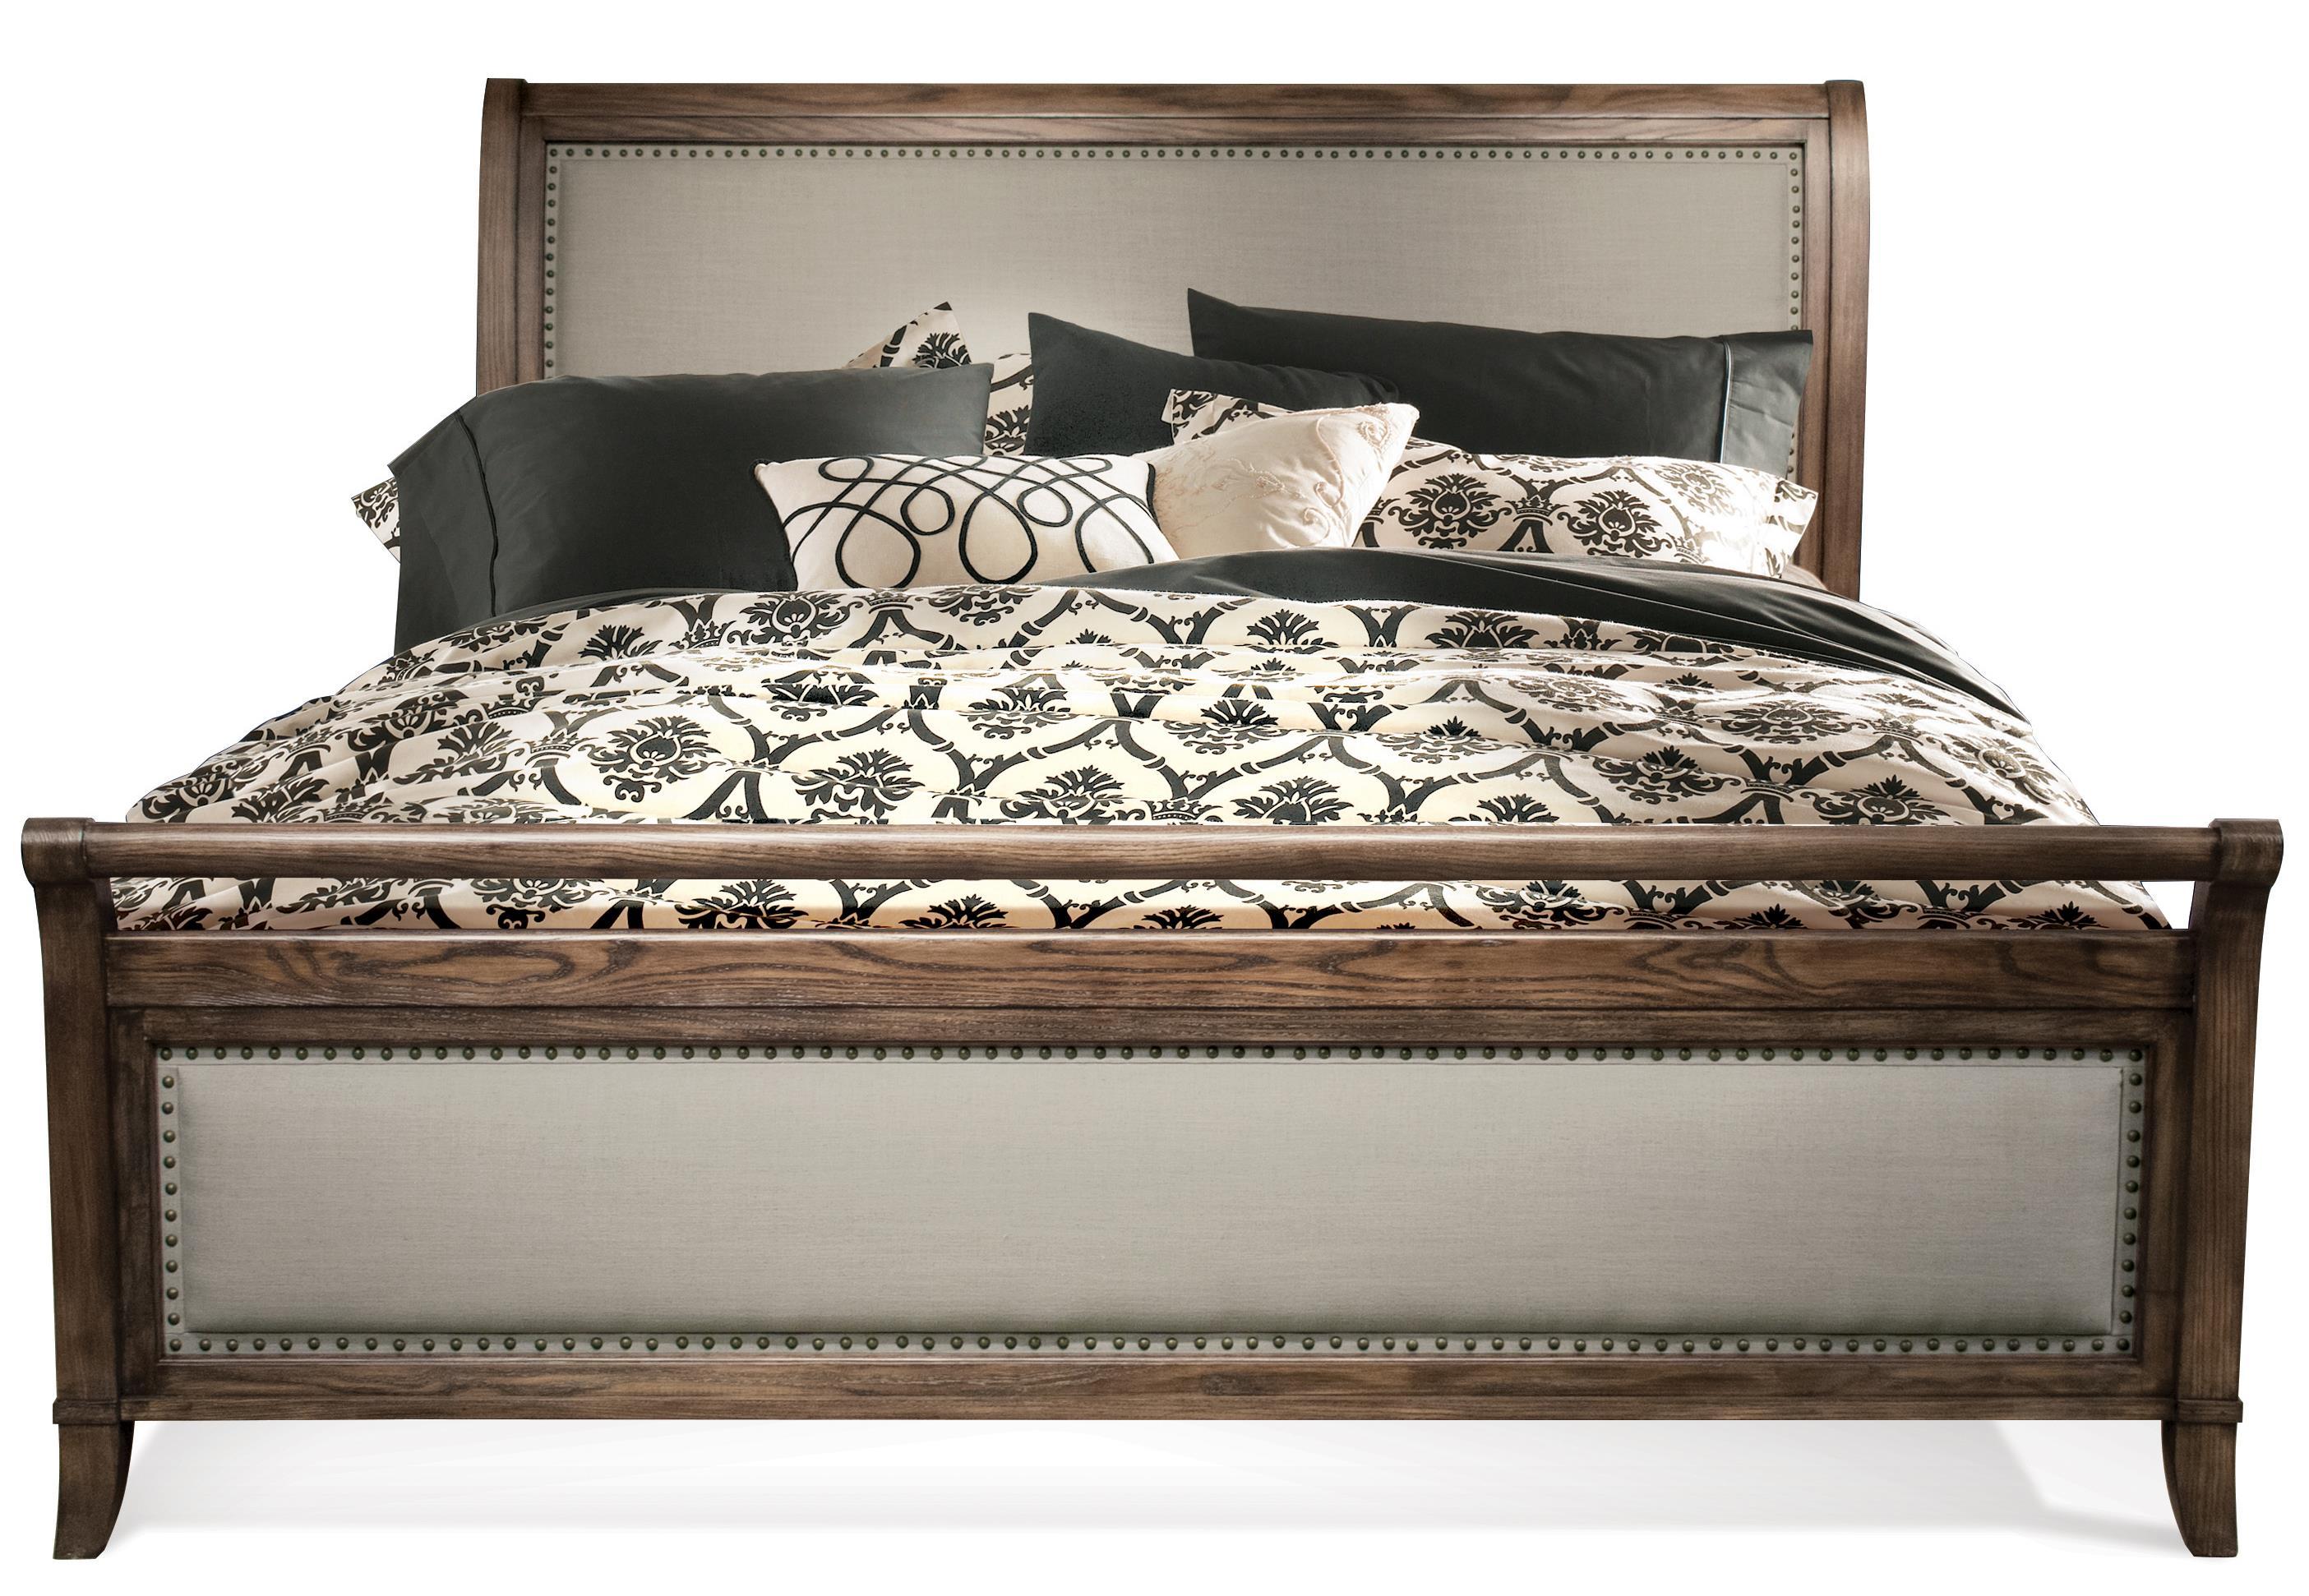 Riverside furniture belmeade king sleigh upholstered bed hudson 39 s furniture sleigh beds for Upholstered sleigh bedroom set